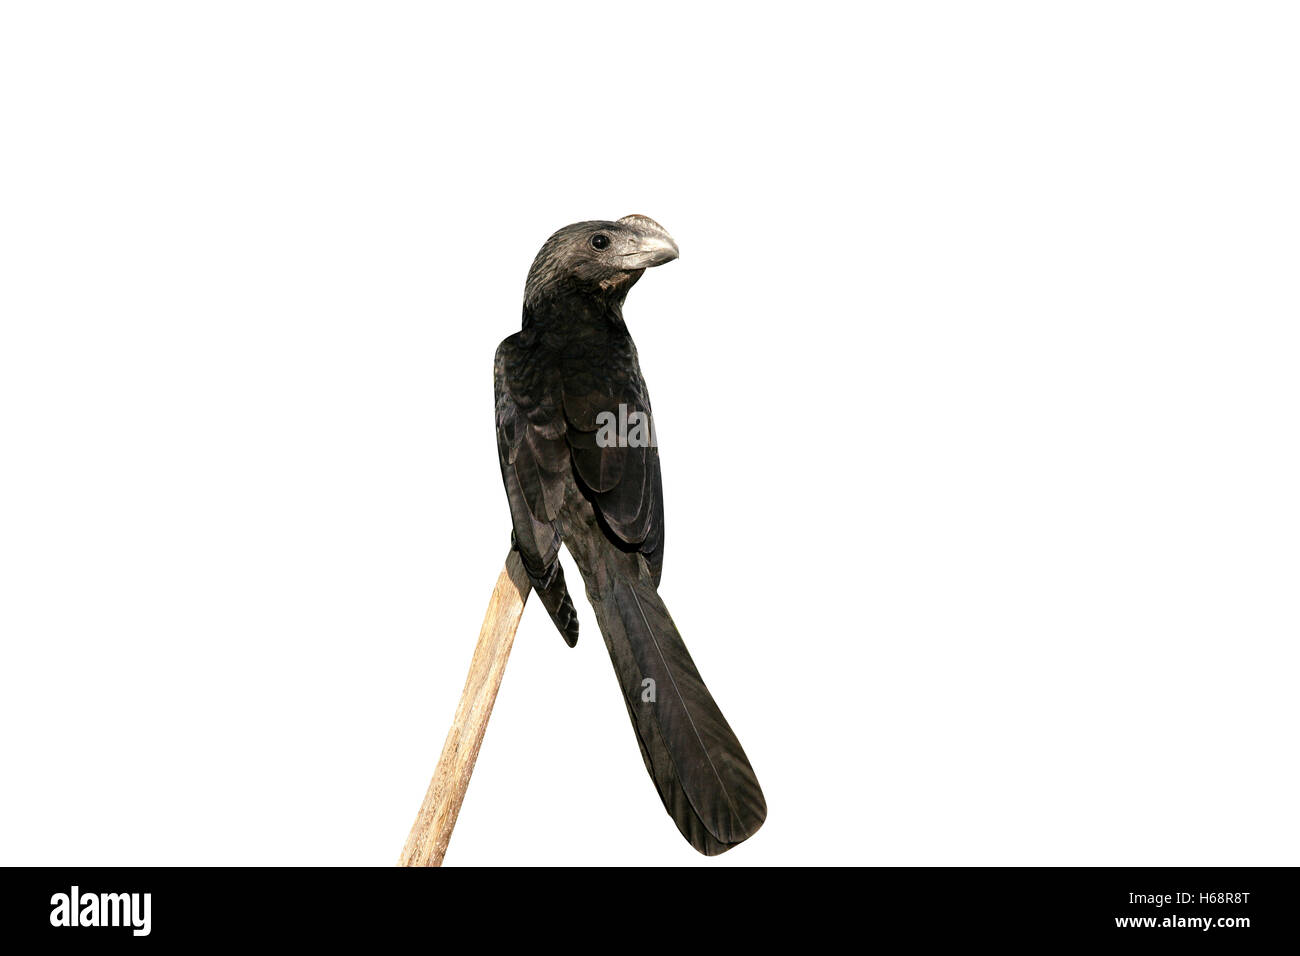 Smooth-billed ani,  Crotophaga ani, single bird on branch, Brazil - Stock Image